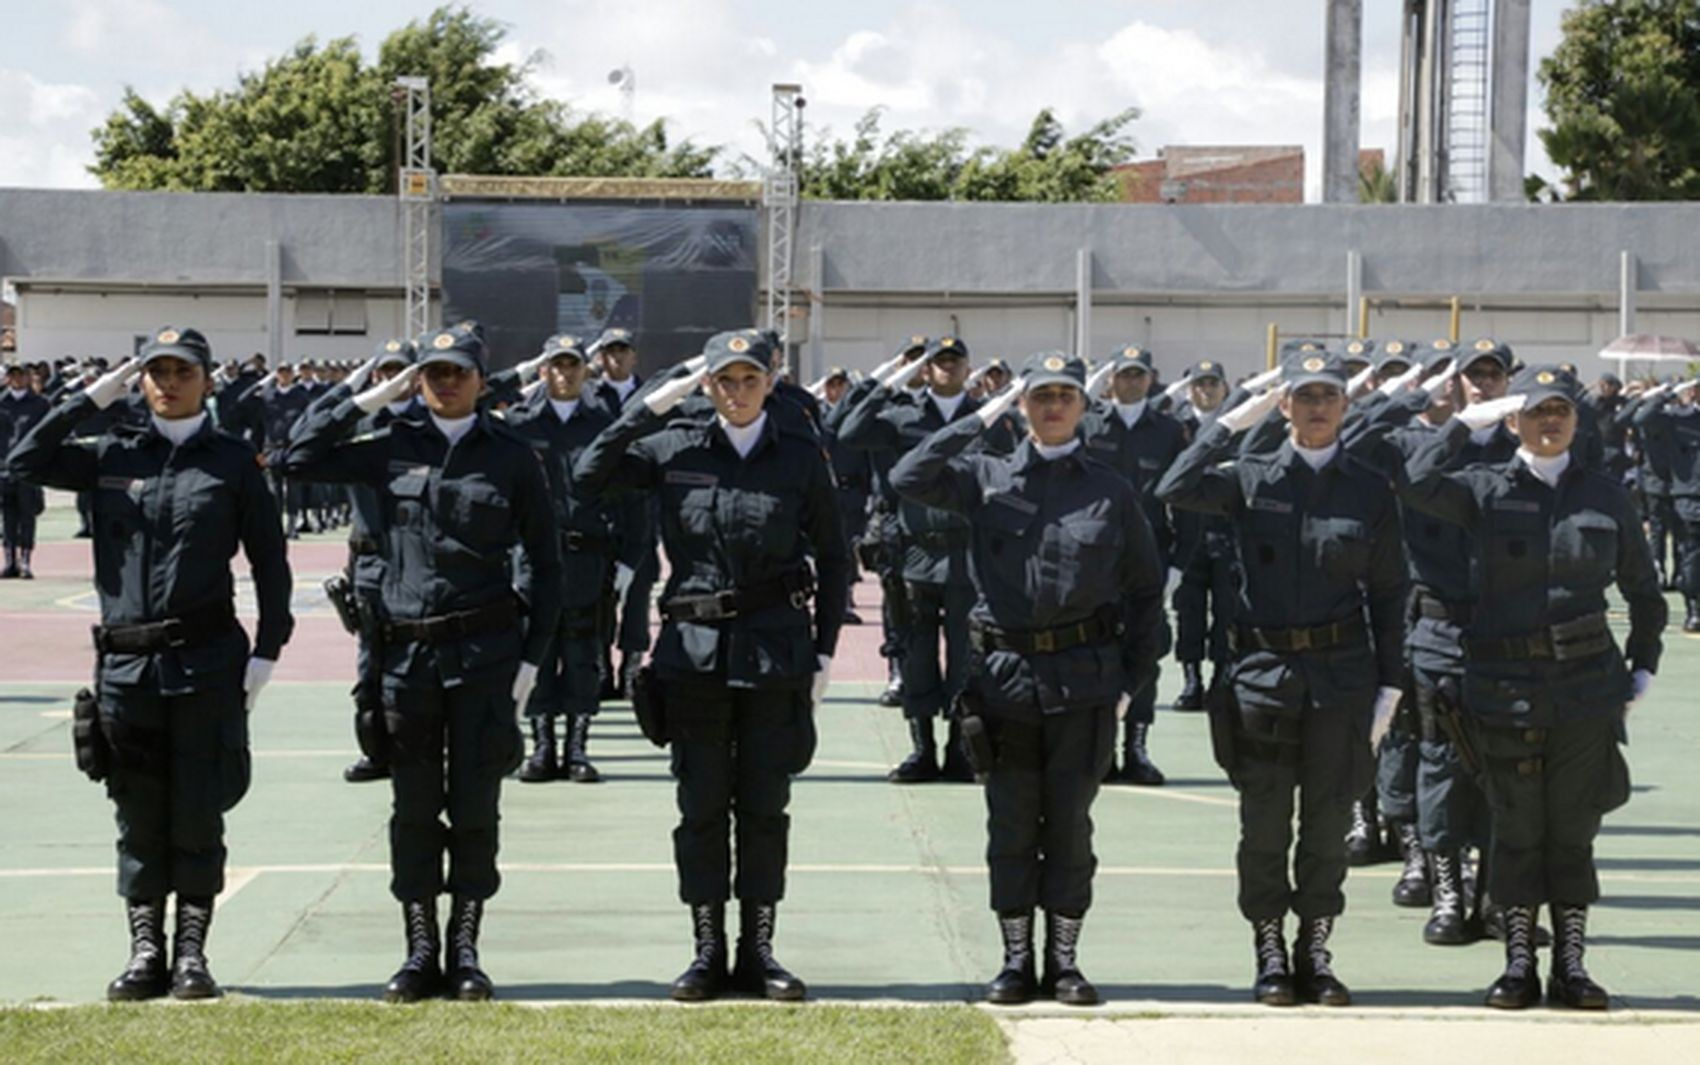 PMSE convoca aprovados nos concursos para oficial e soldado - Noticias